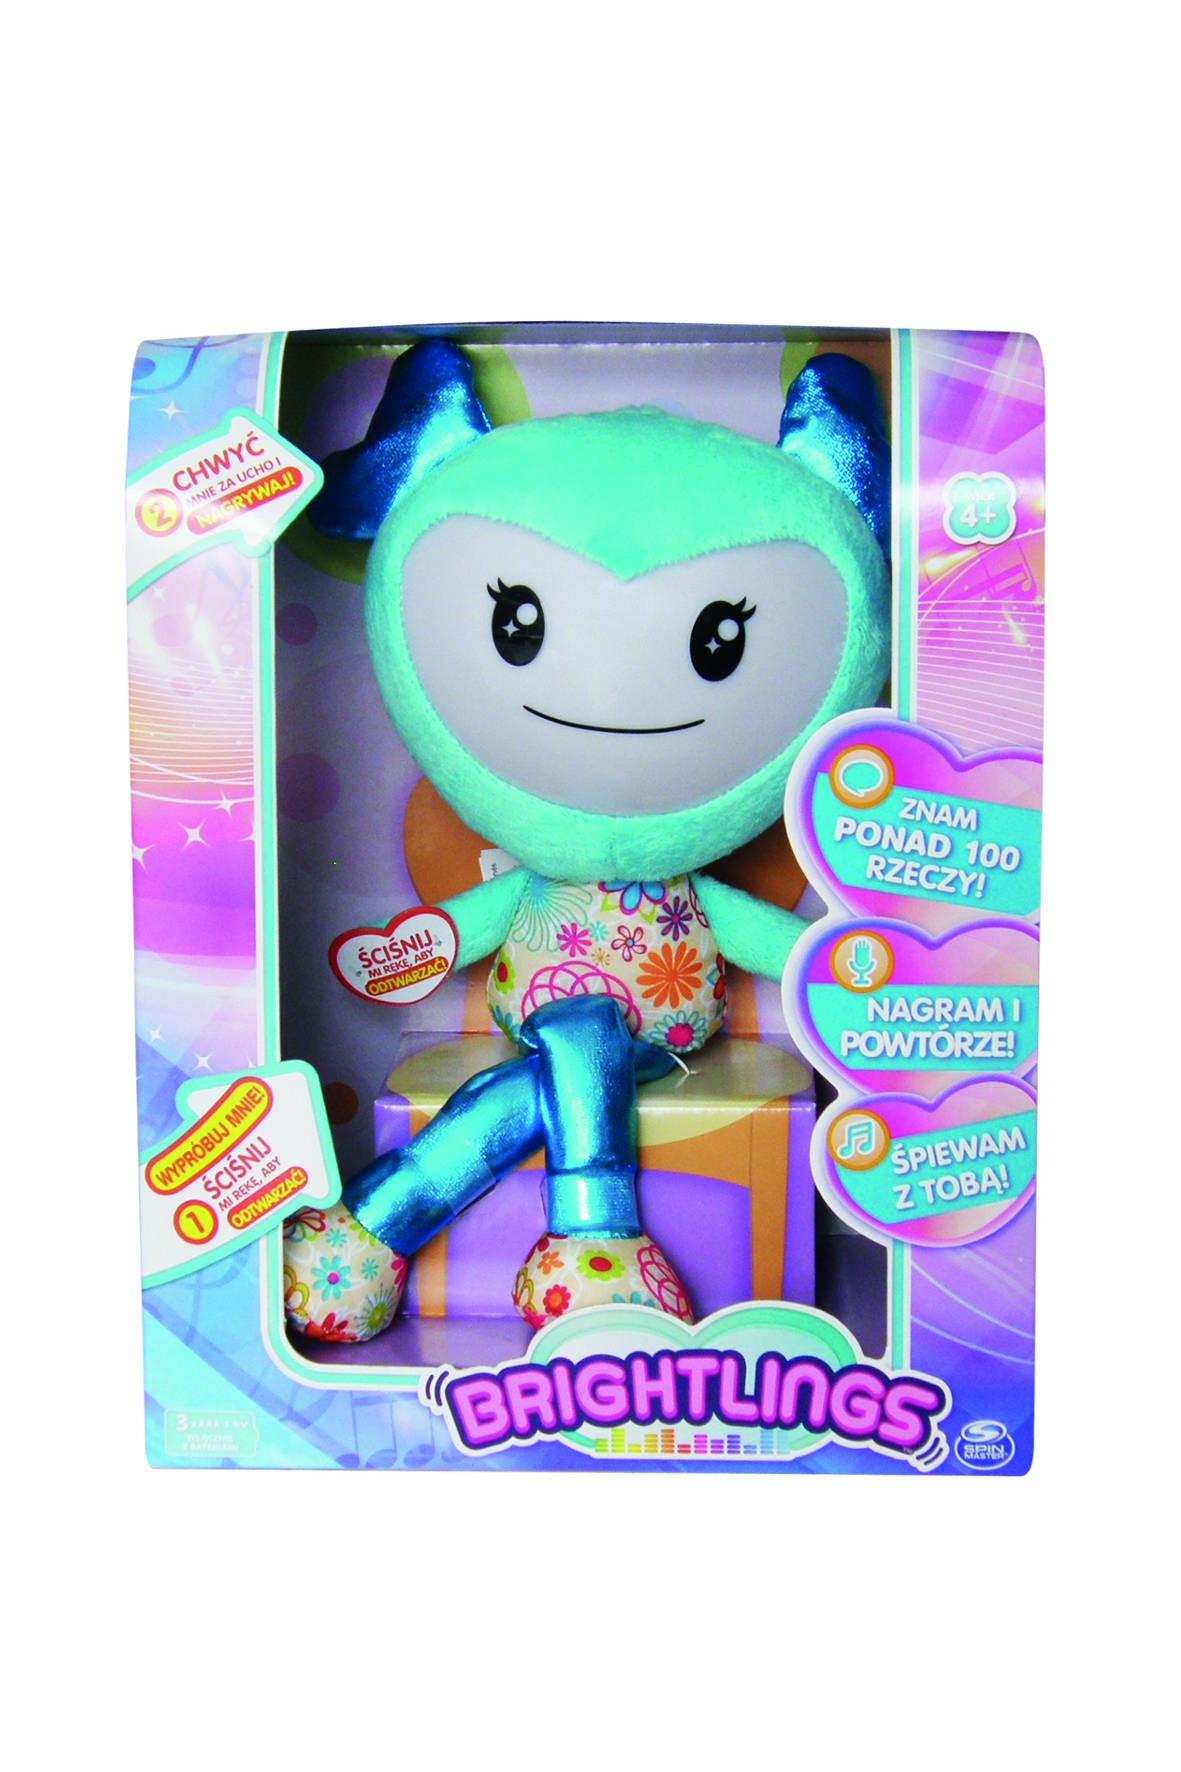 Brightlings - lalka interaktywna